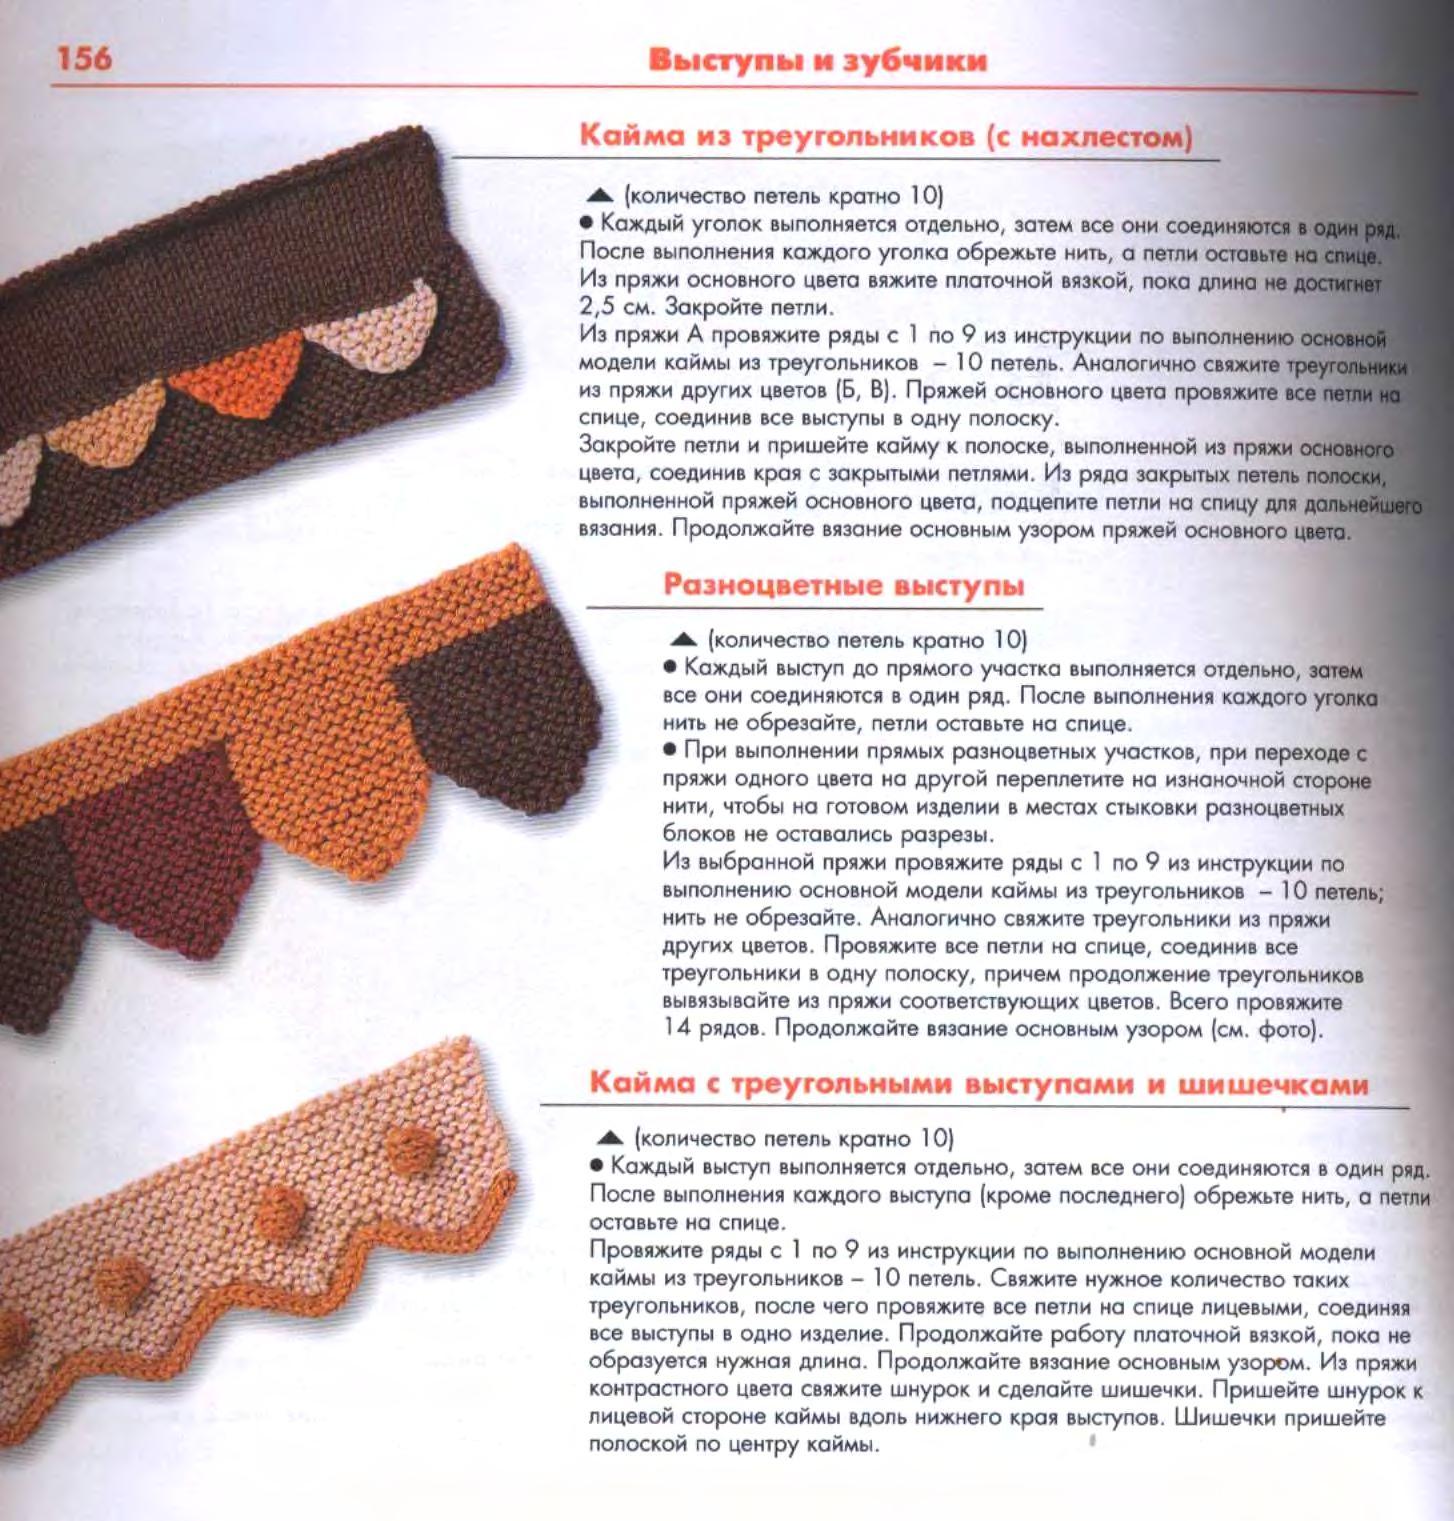 Край вязания зубчиками на спицах